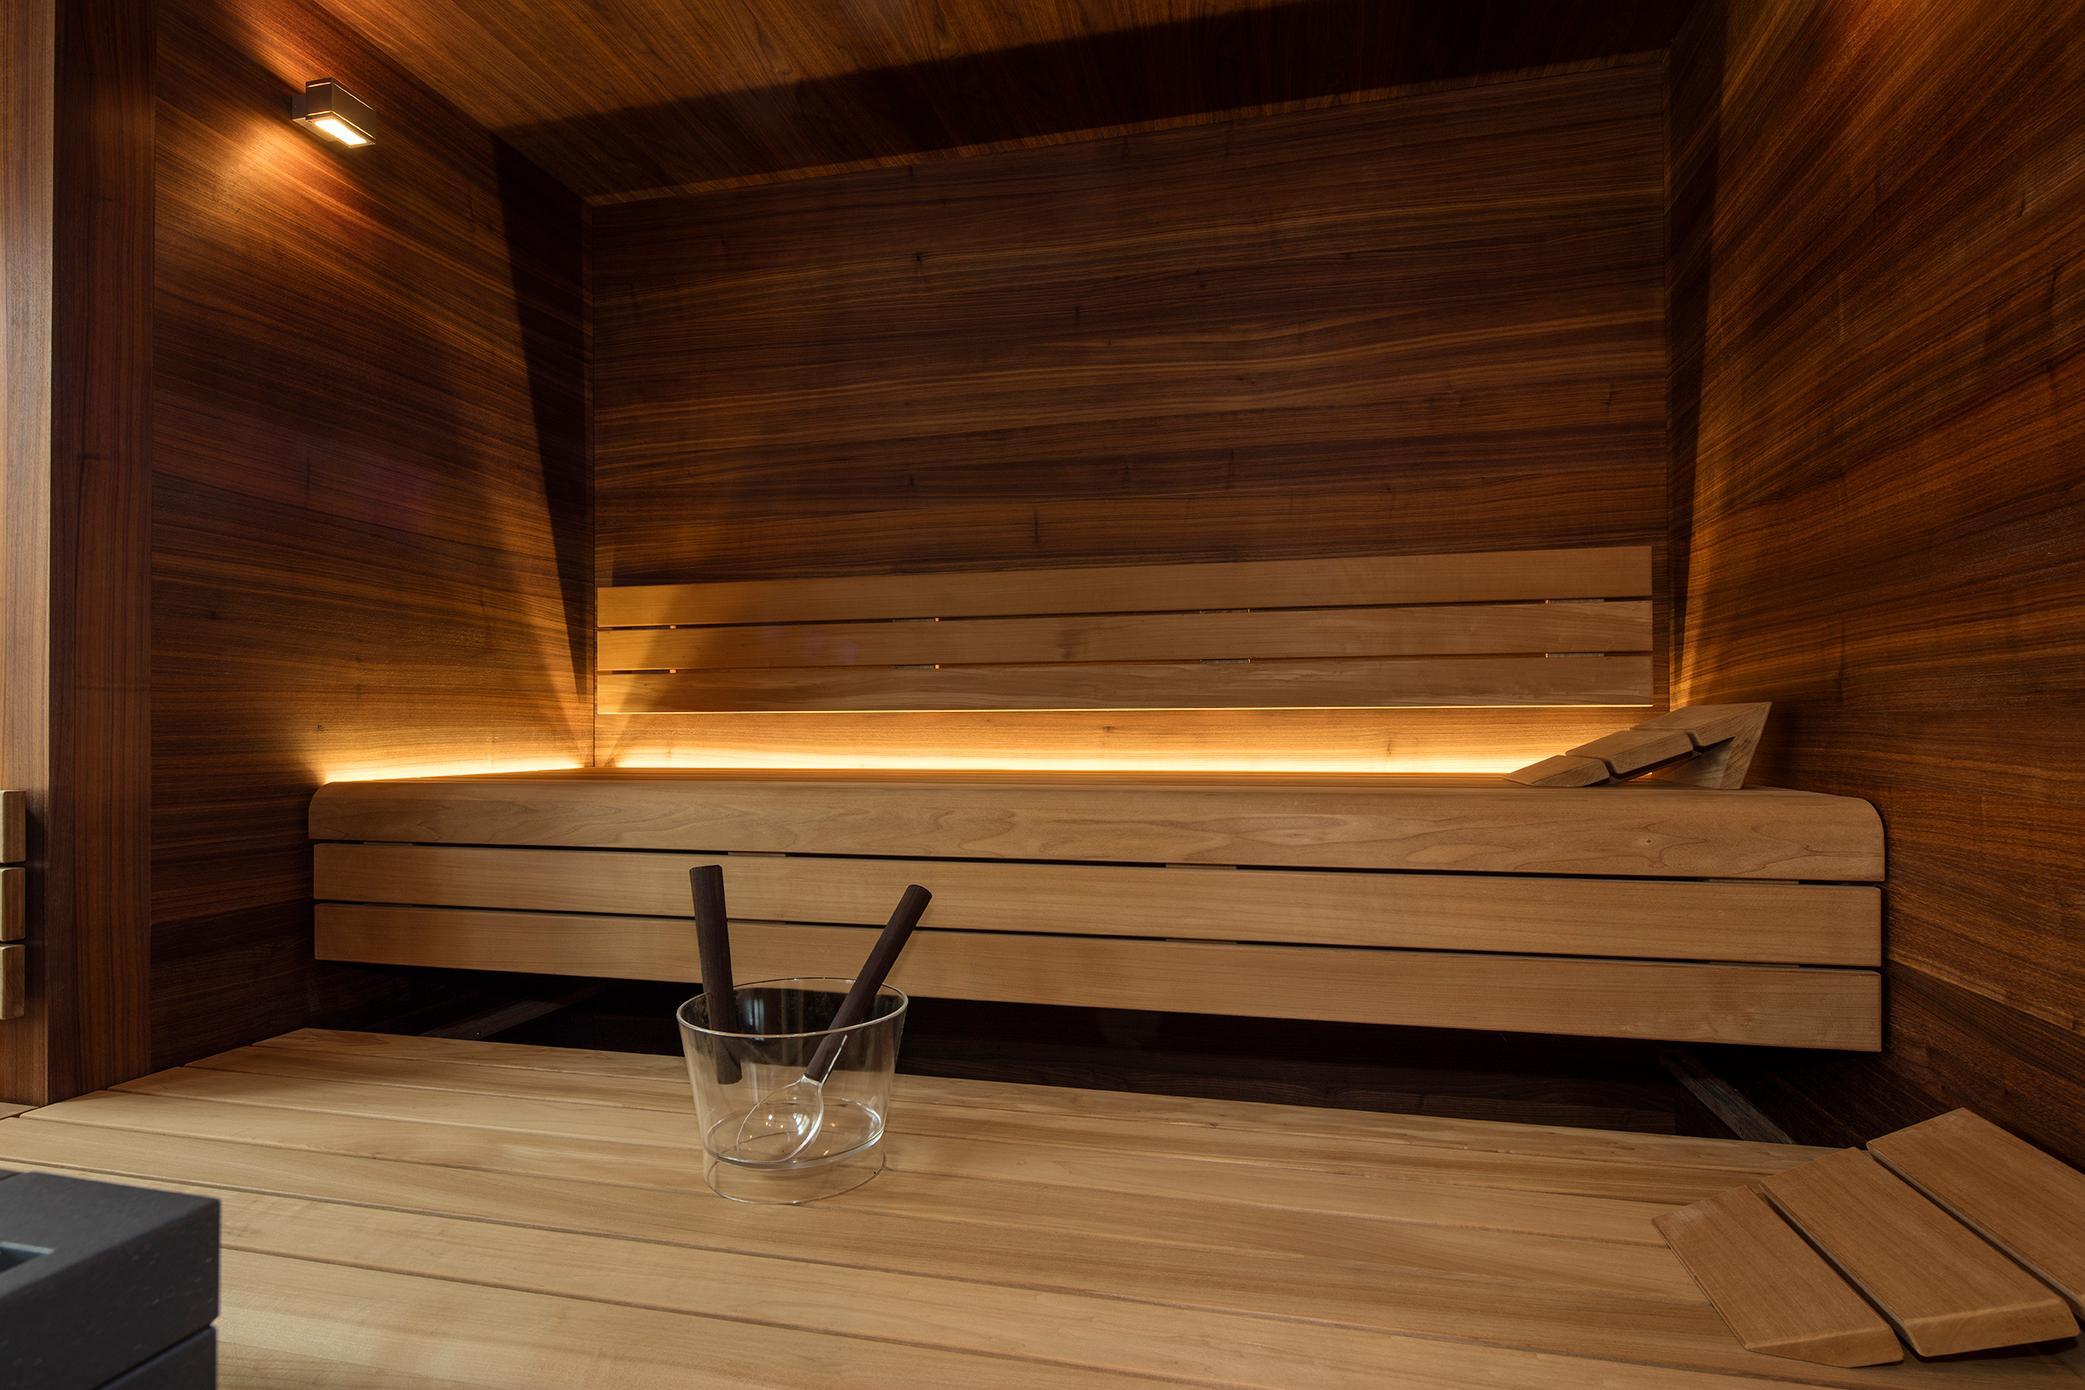 Extrem Desingsauna als Möbelstück #sauna #badsauna ©corso s... FN84